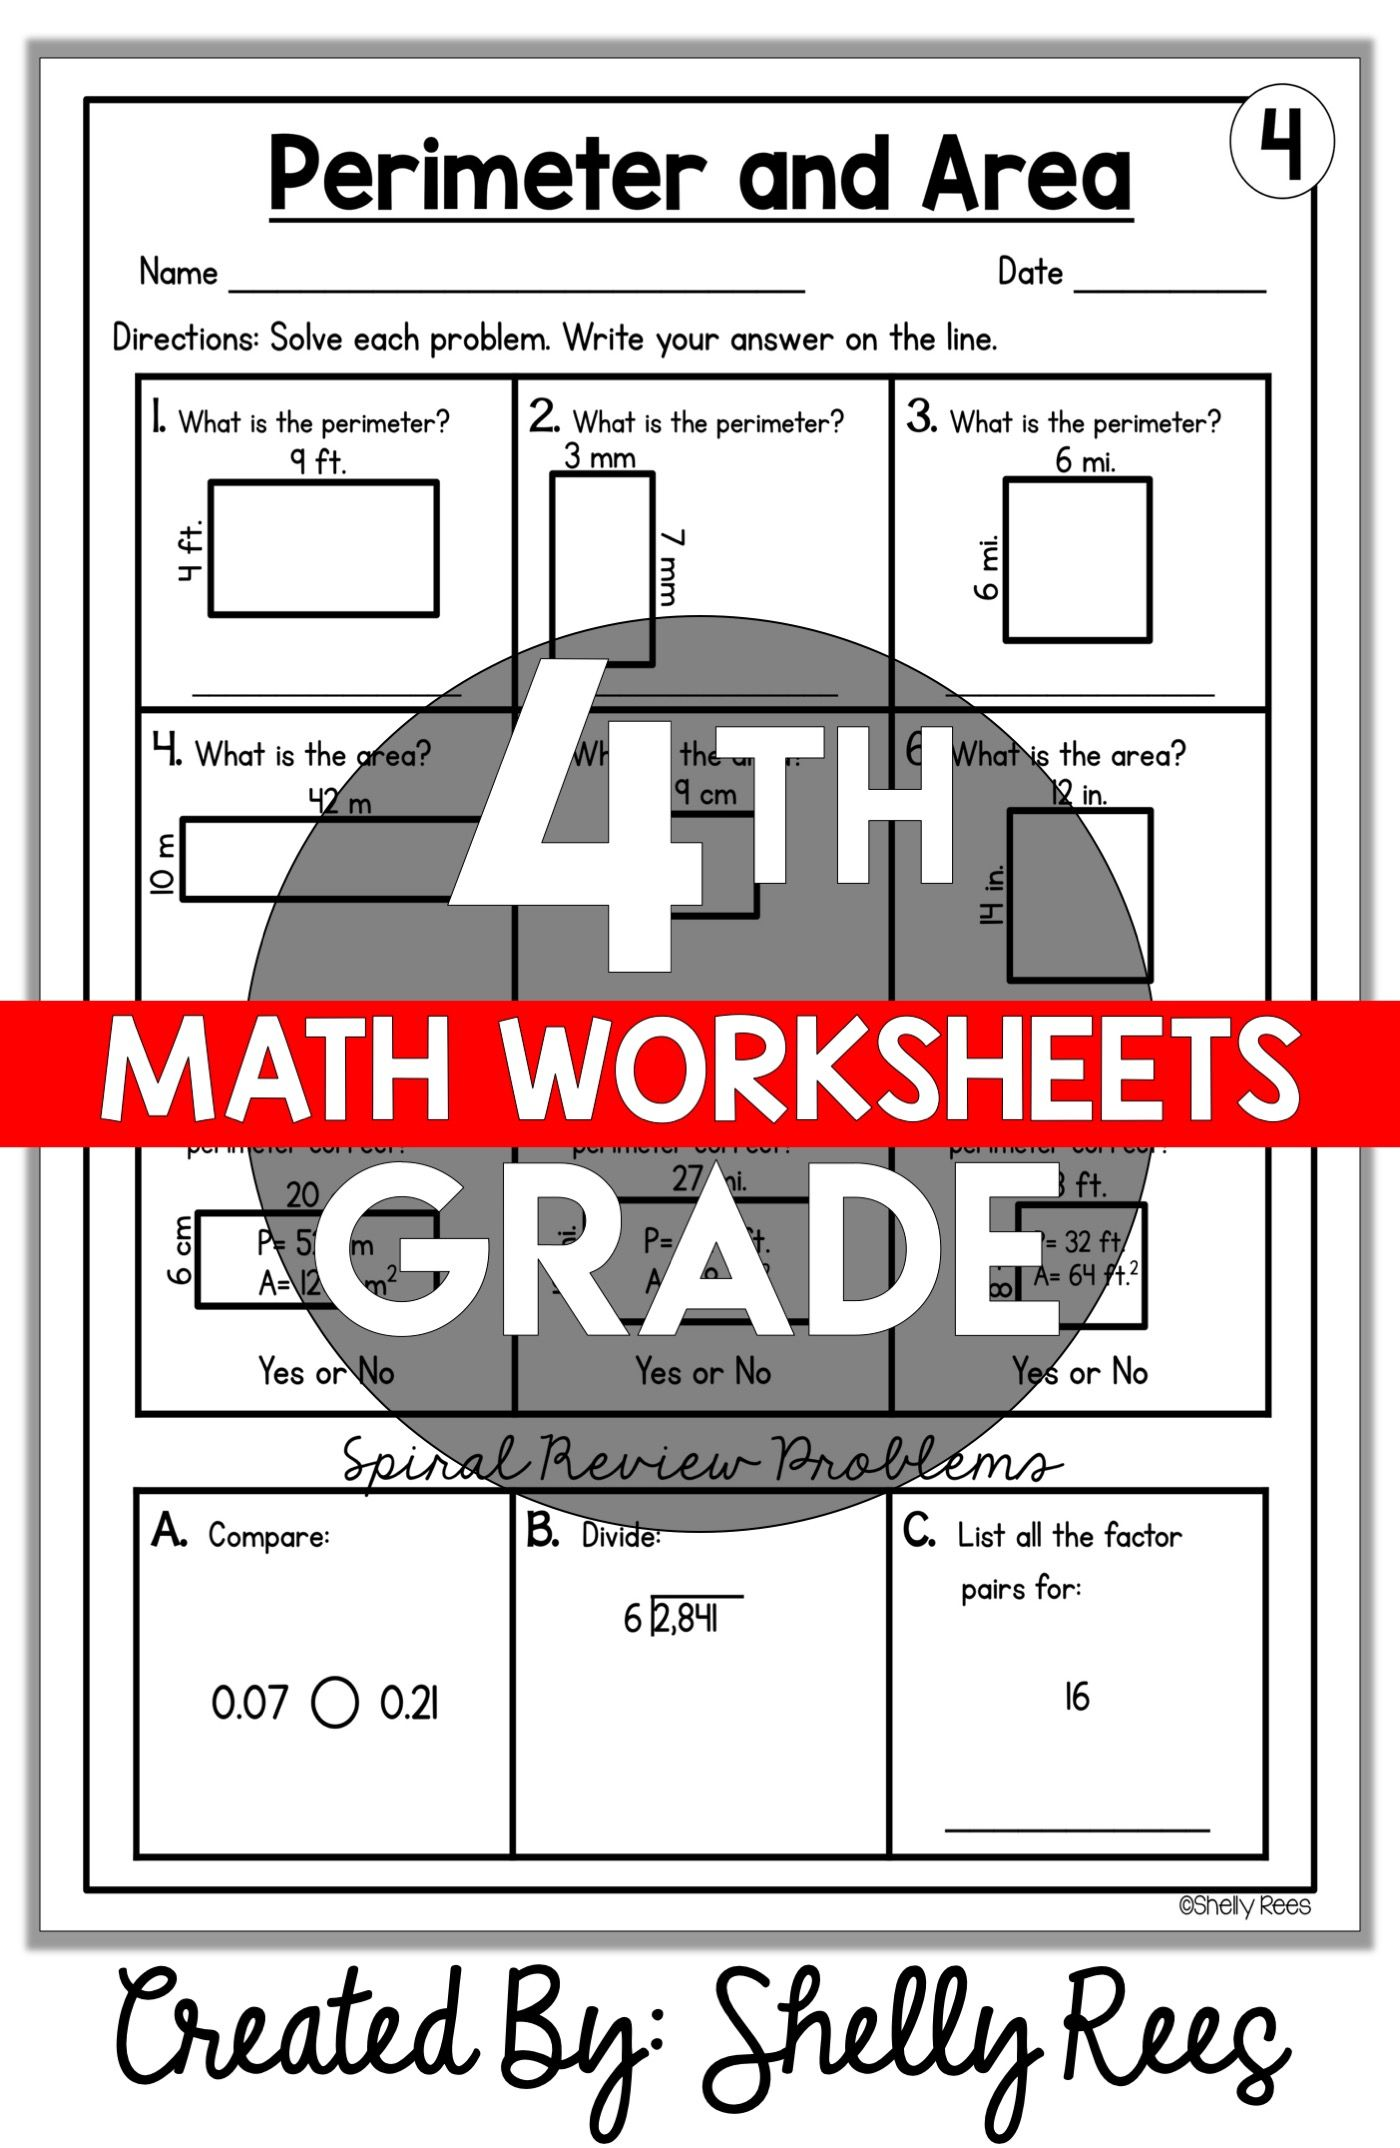 medium resolution of 4th Grade Math Worksheets Free and Printable - Appletastic Learning   Math  worksheets